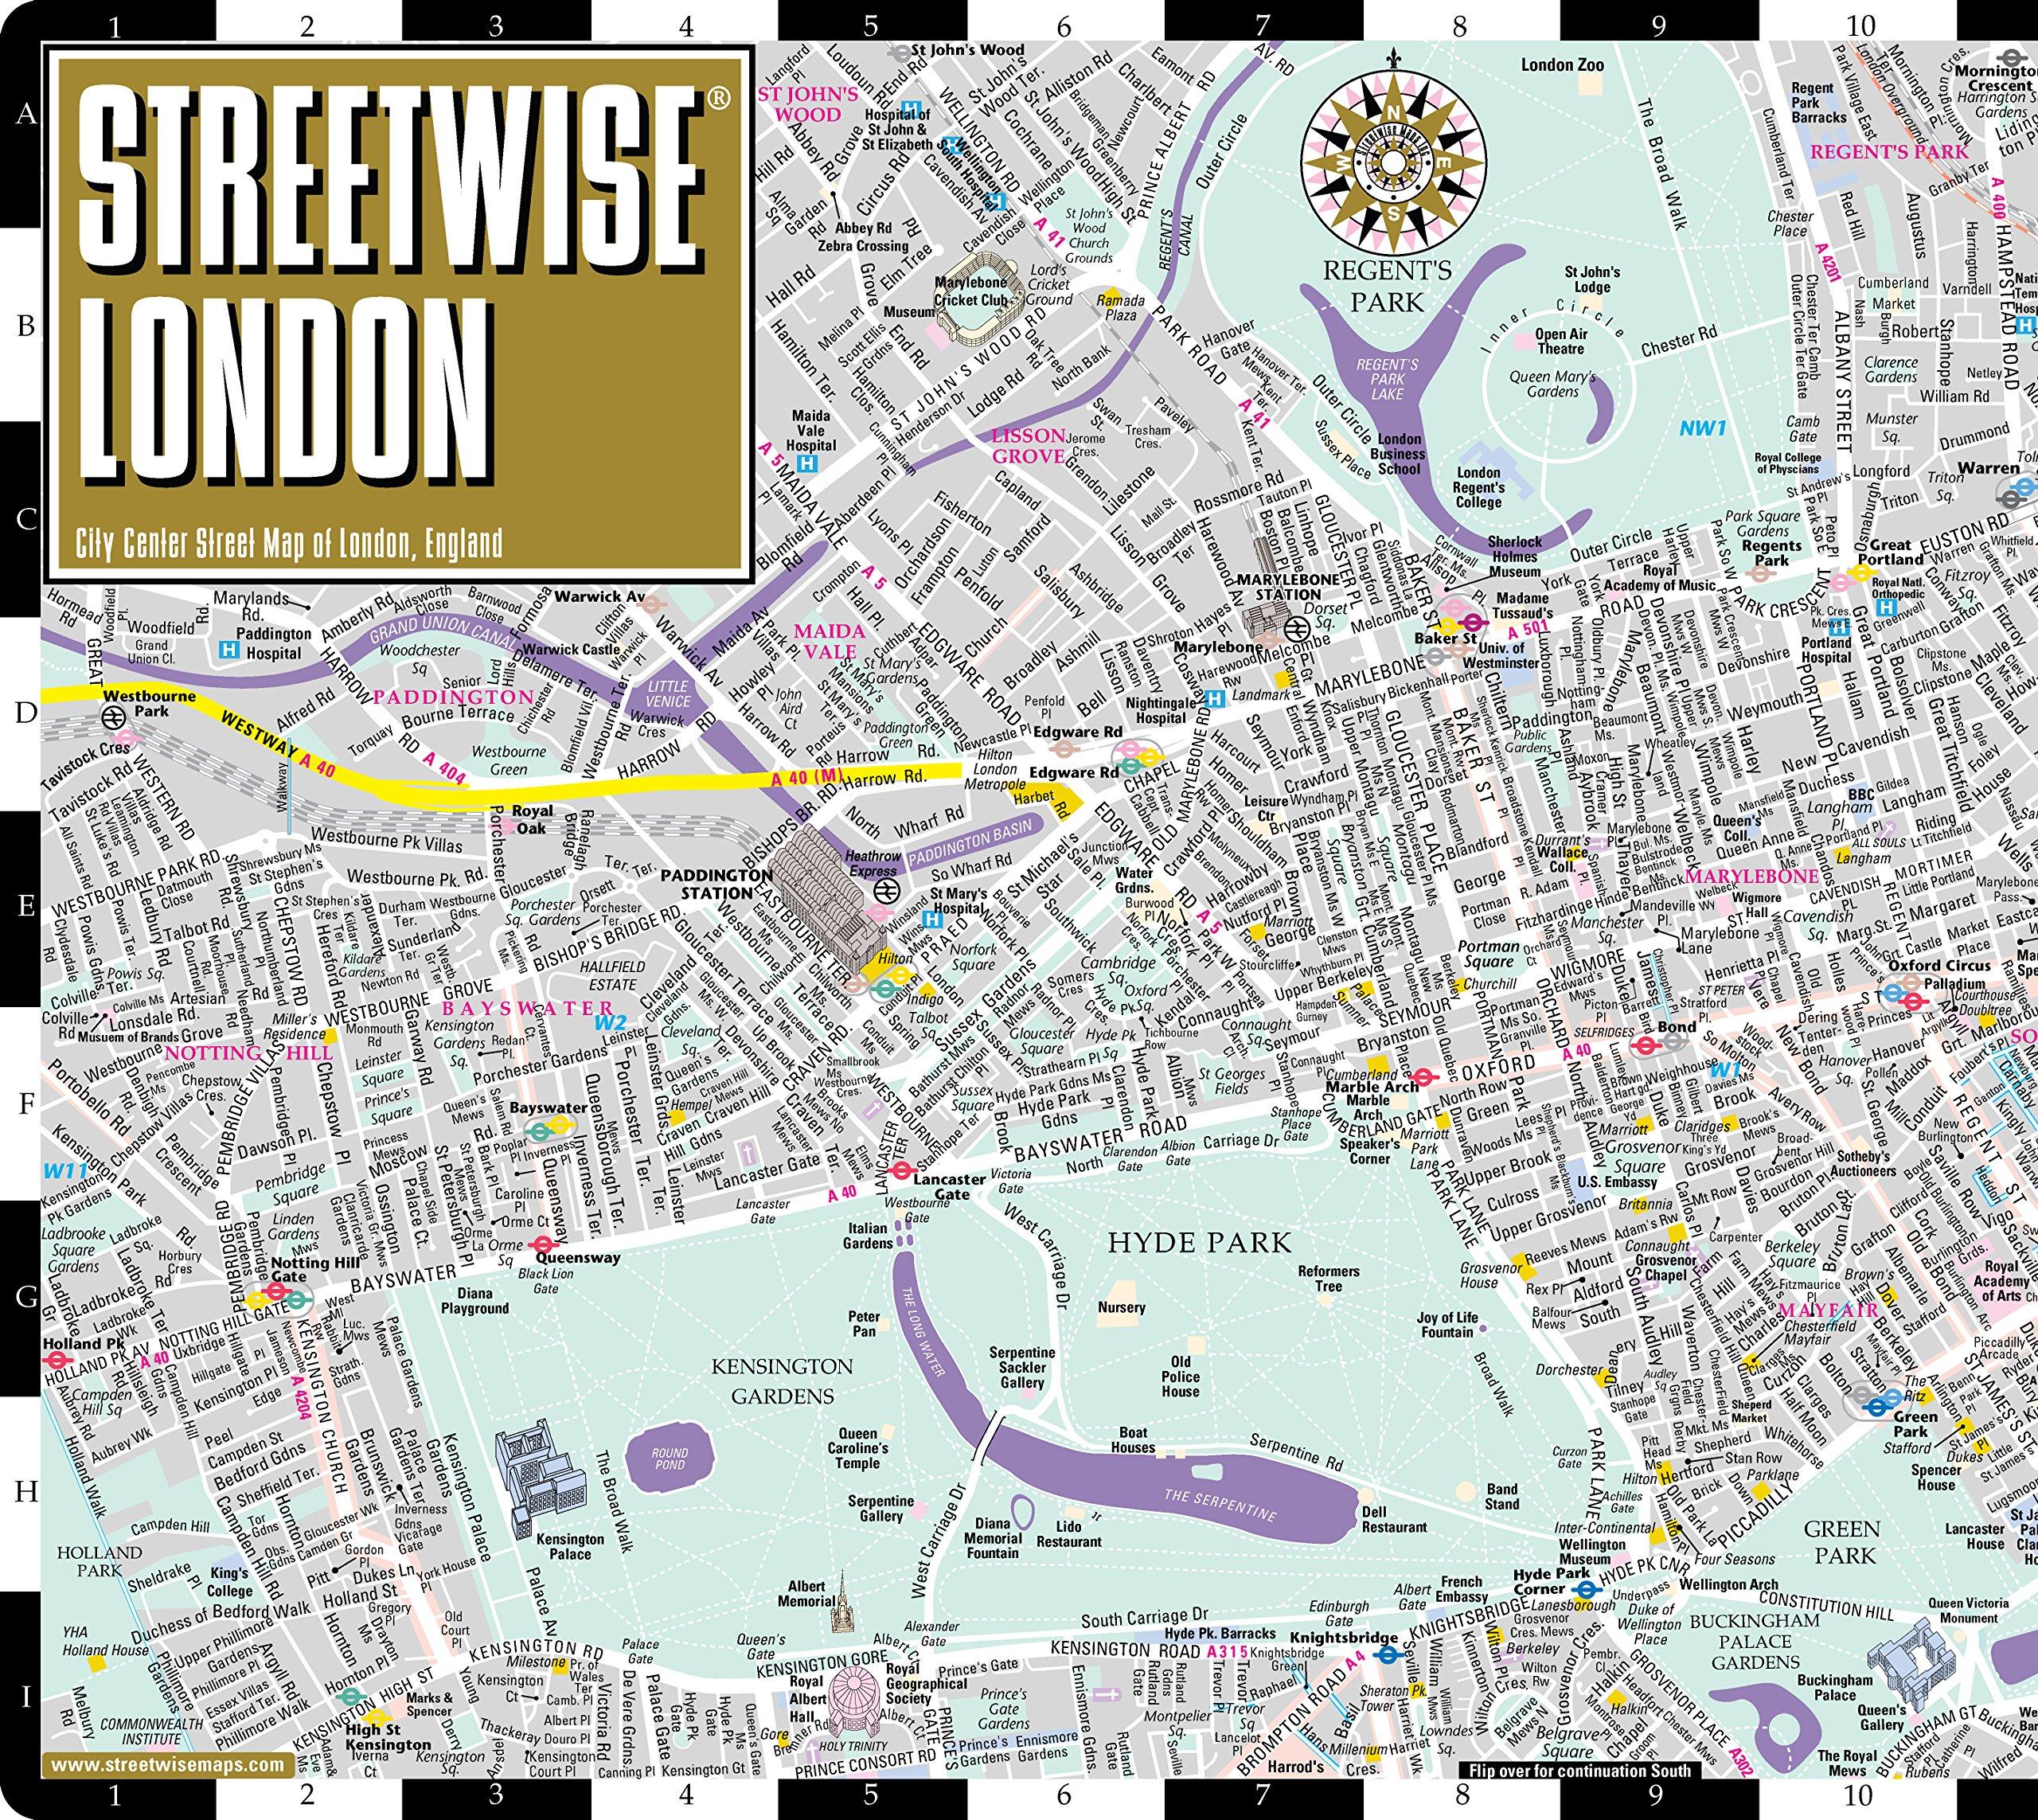 streetwise london map laminated city center street map of london england streetwise maps 9780935039276 amazoncom books